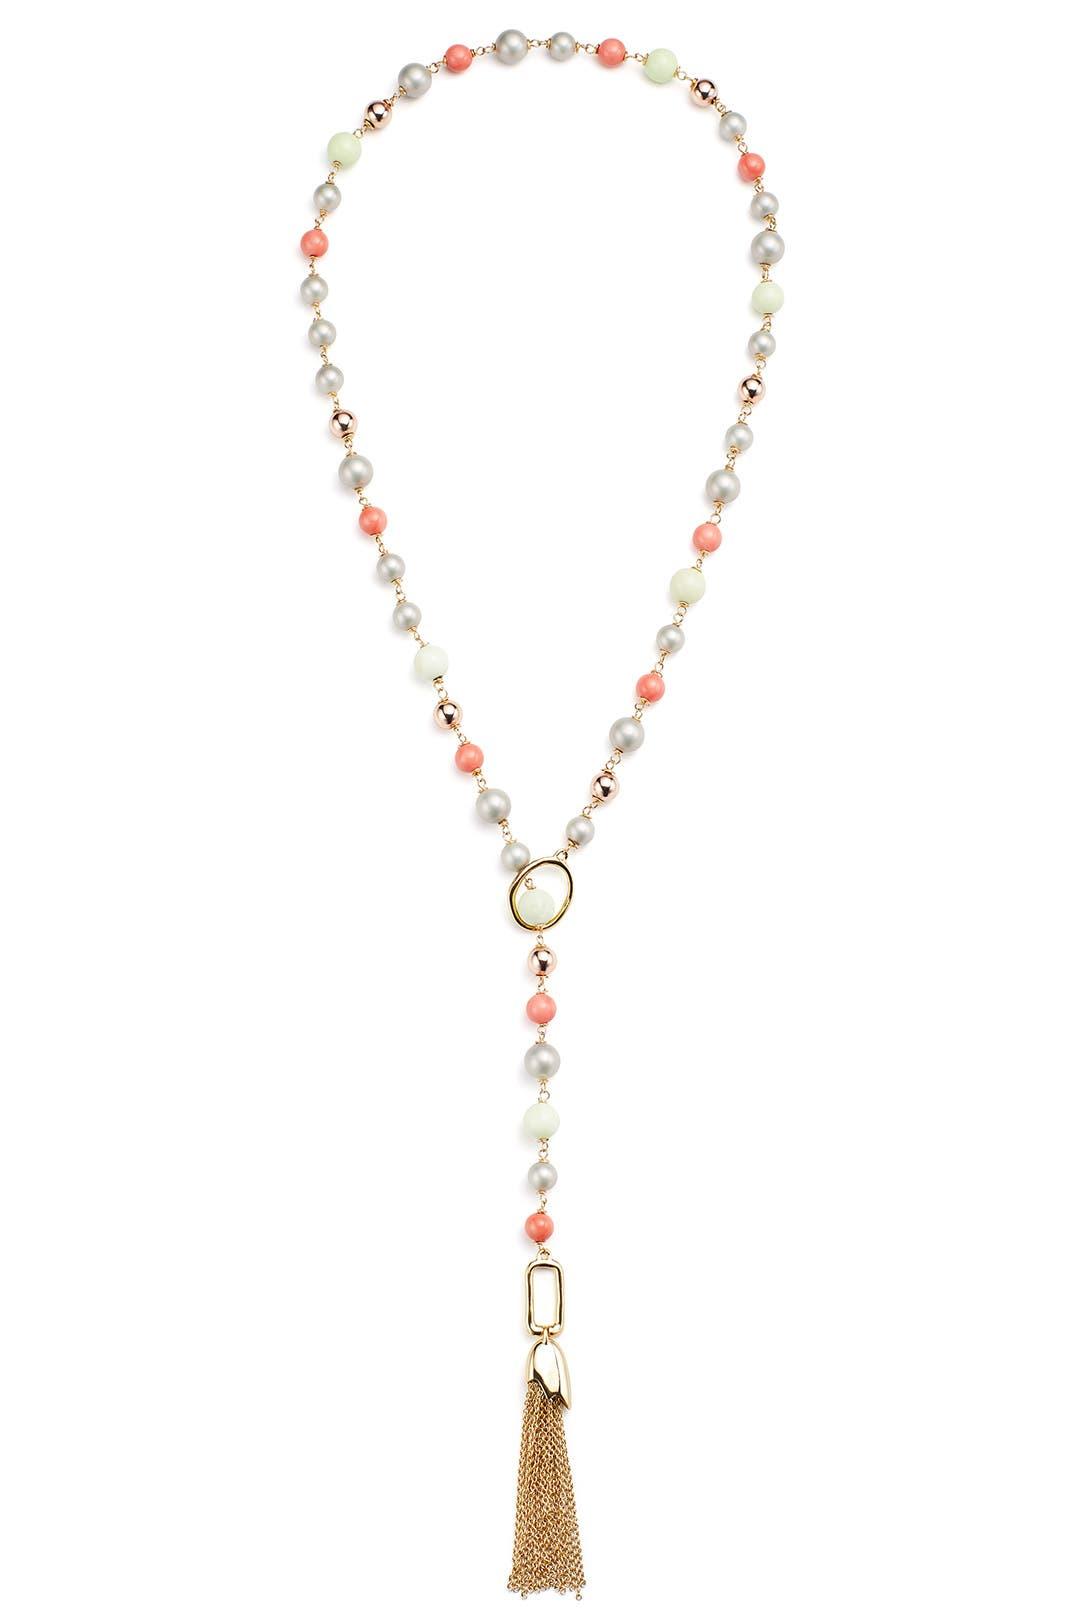 Alexis Bittar Beaded Lariat Tassel Necklace ylTwnYk8